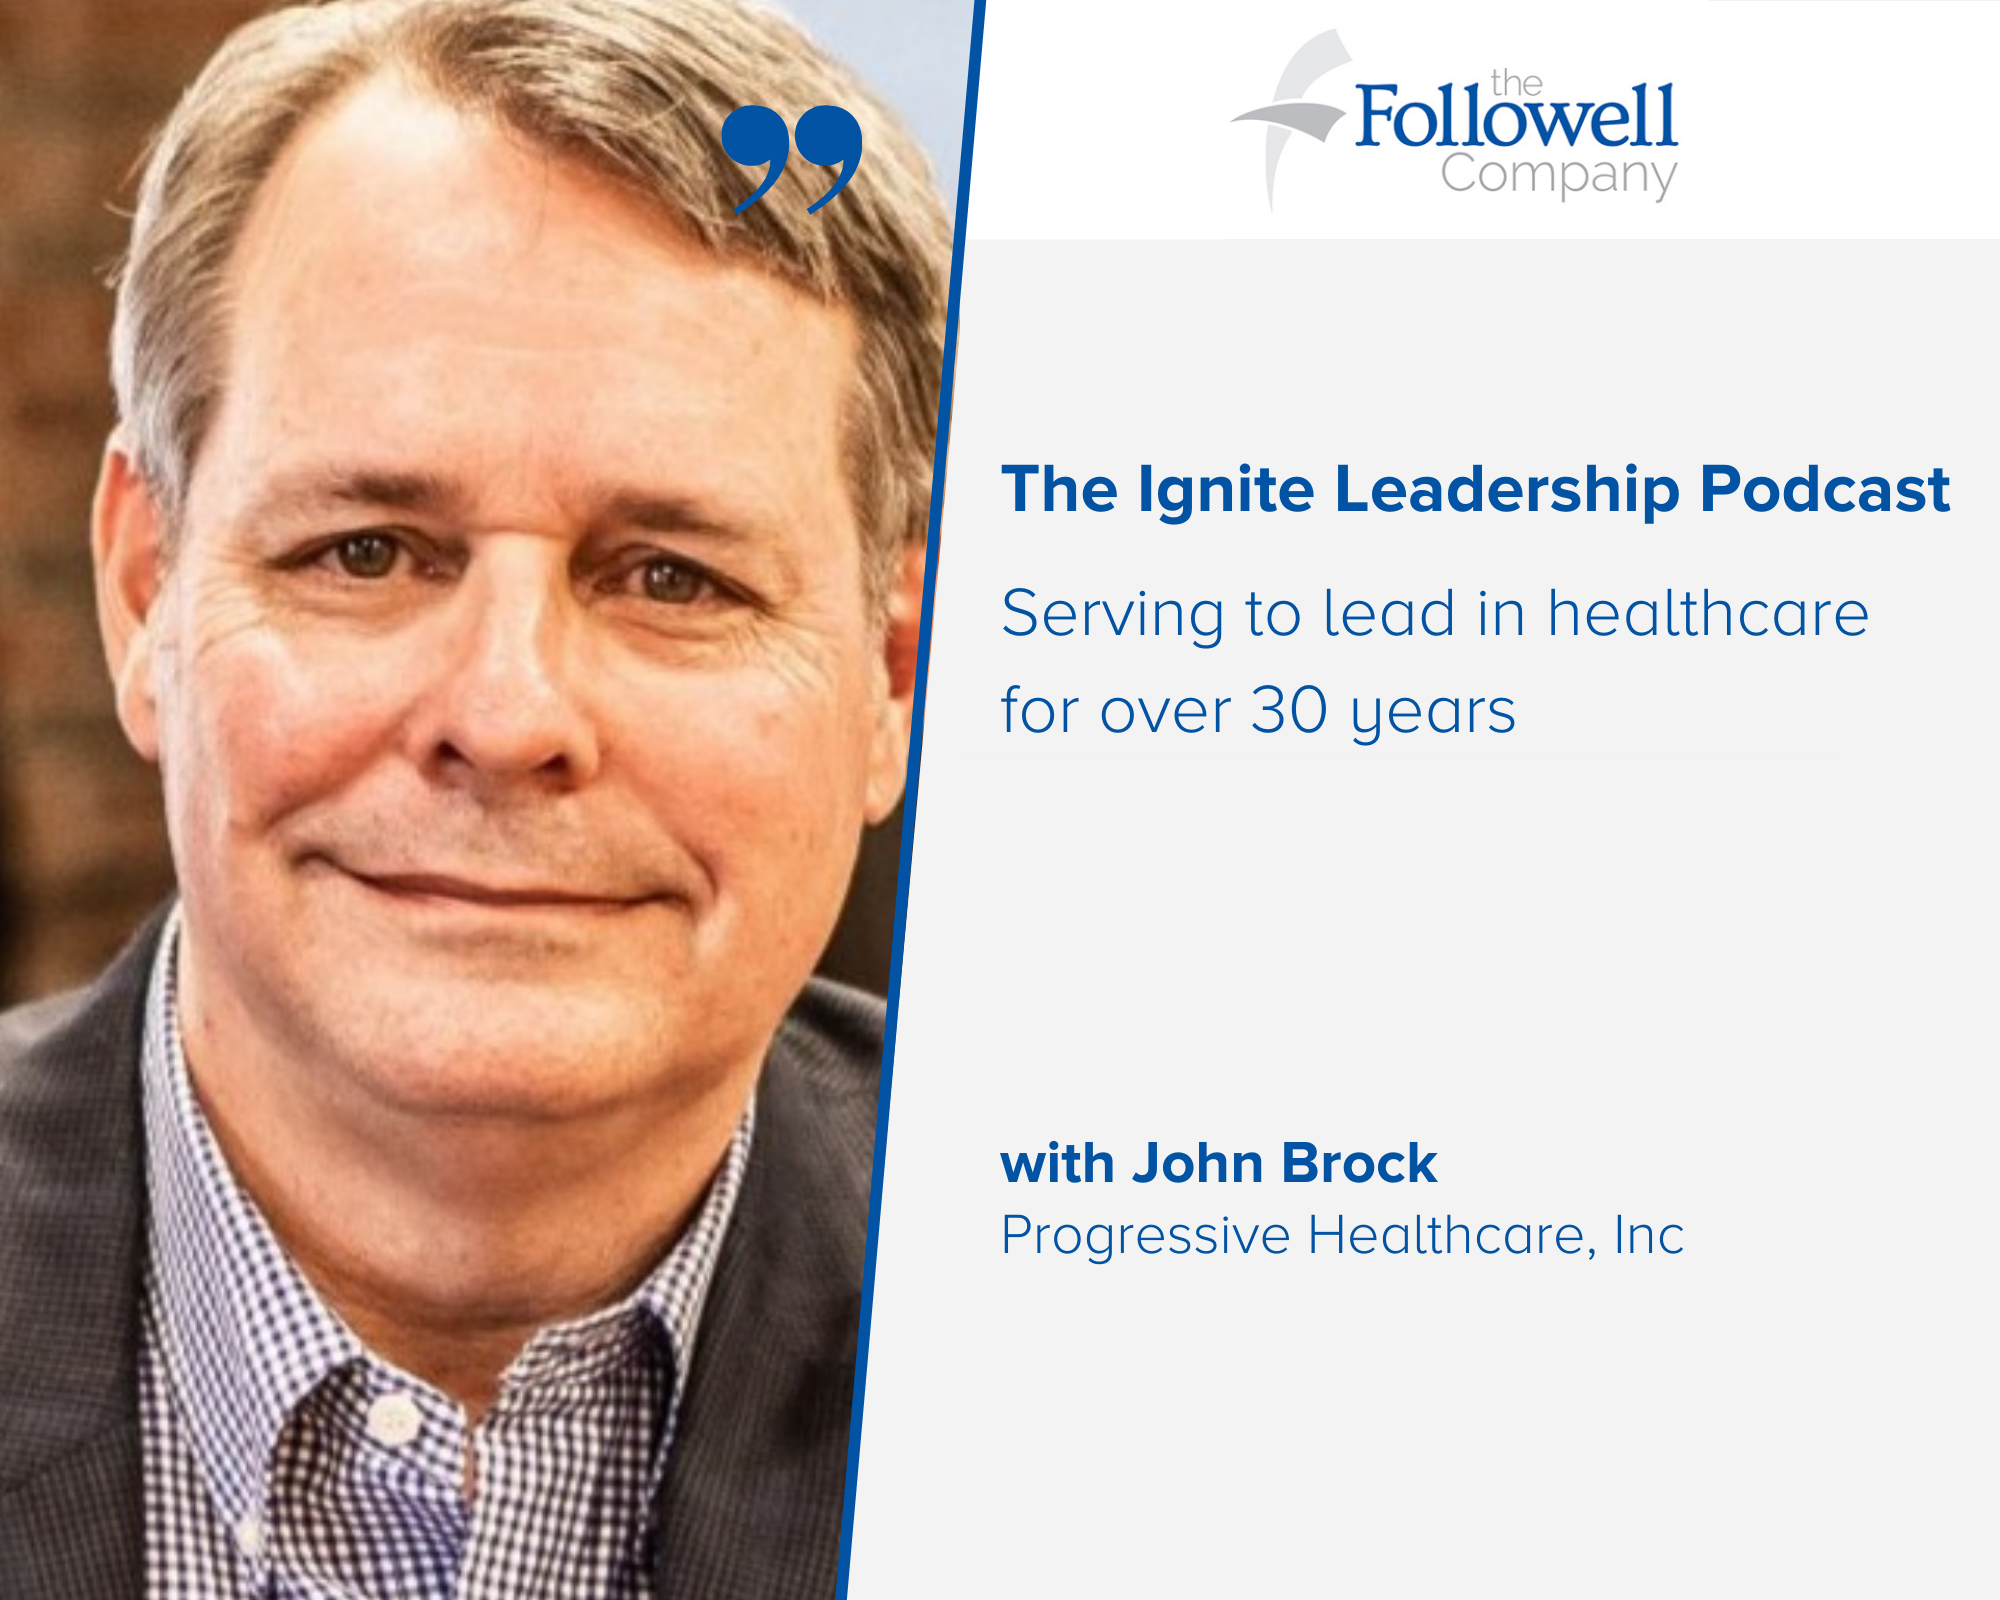 Picture of John Brock, Director at Progressive Healthcare, Brentwood TN